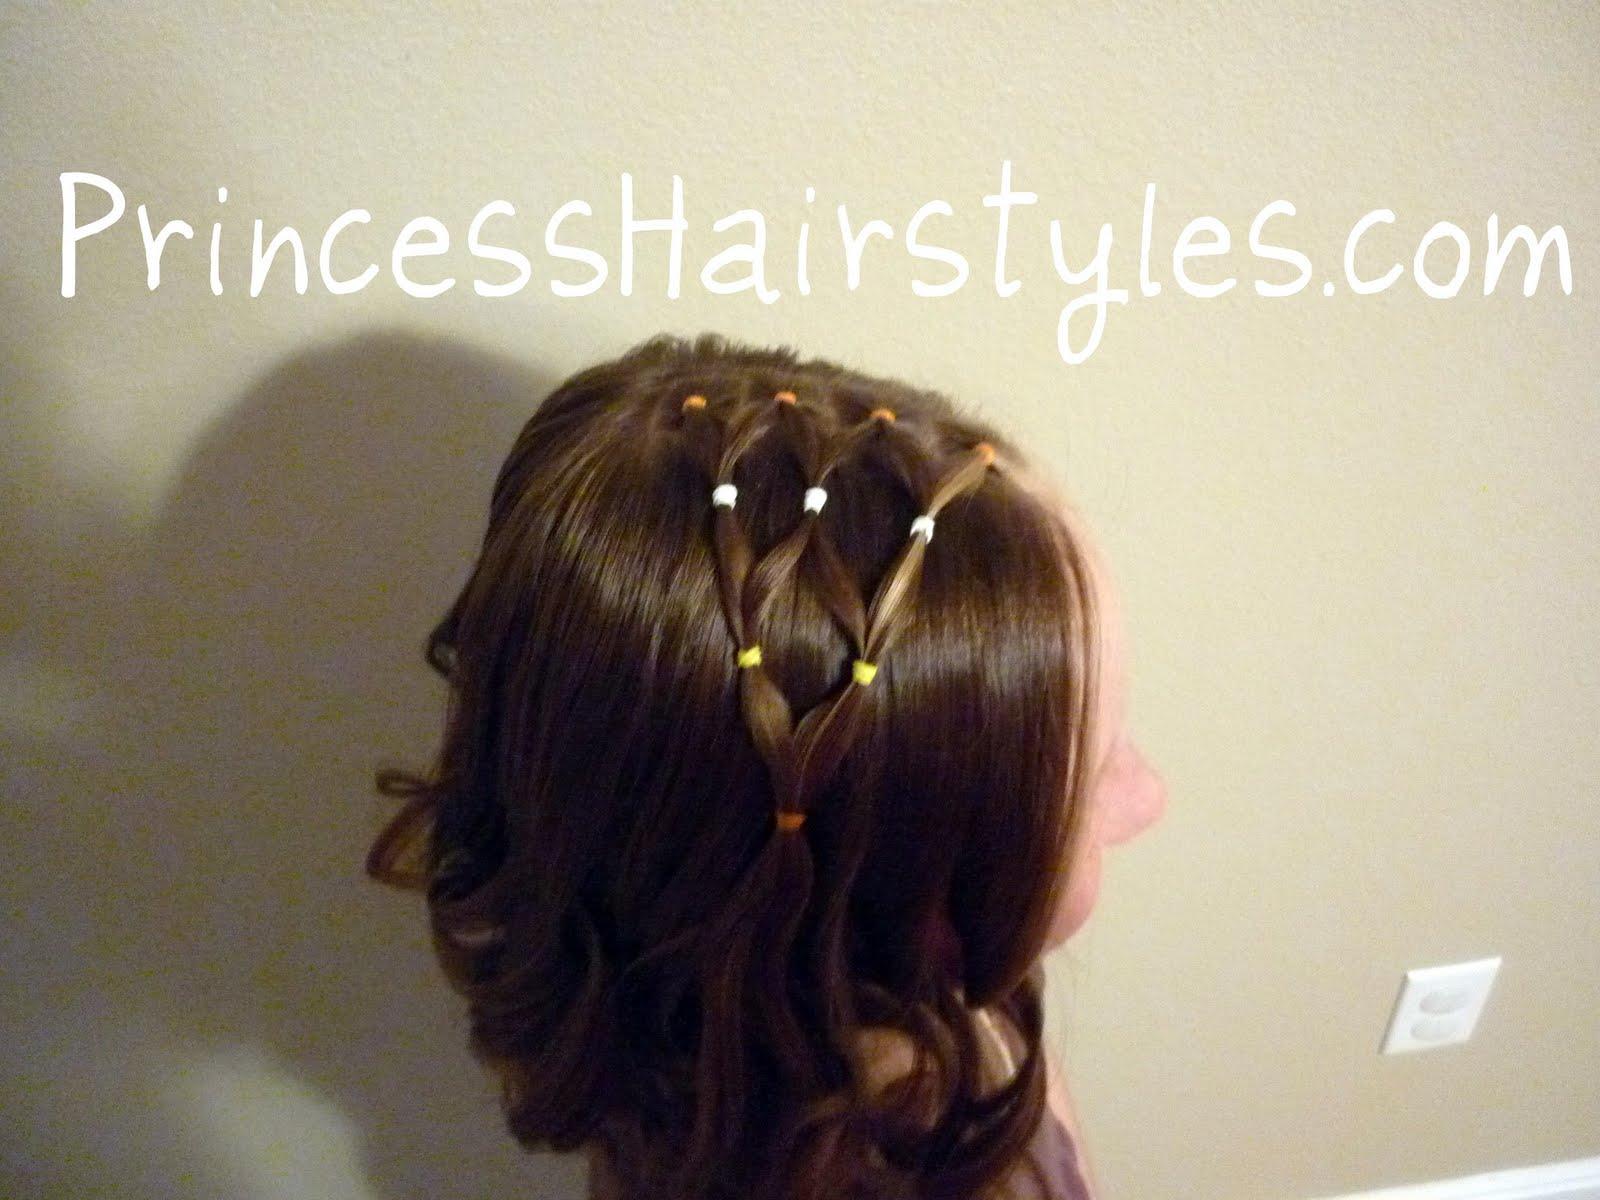 Pleasing Halloween Hairstyles Hairstyles For Girls Princess Hairstyles Short Hairstyles Gunalazisus